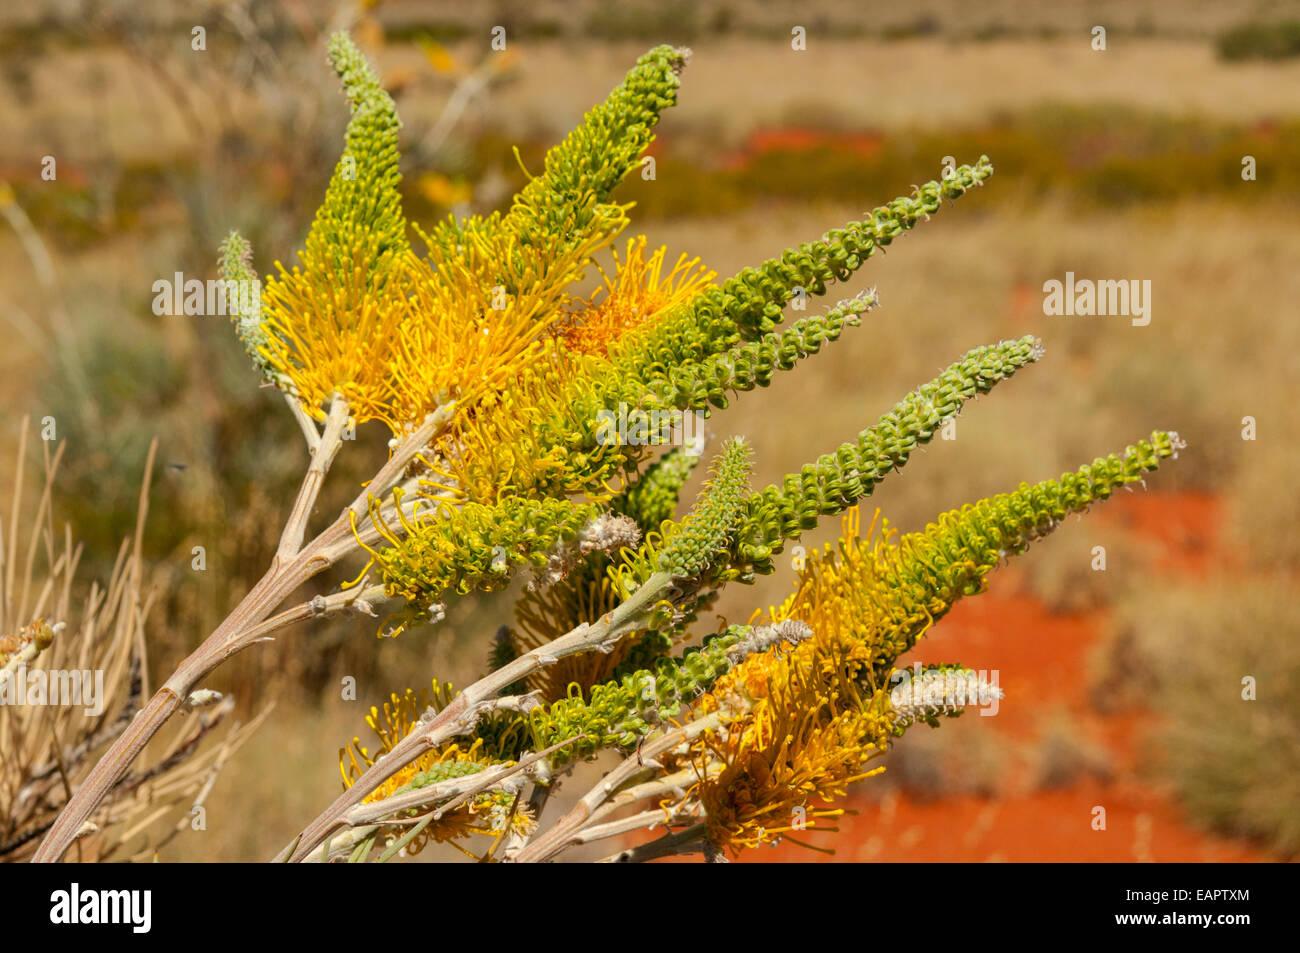 Grevillea poorinda, Golden Lyre, near Exmouth, WA, Australia - Stock Image